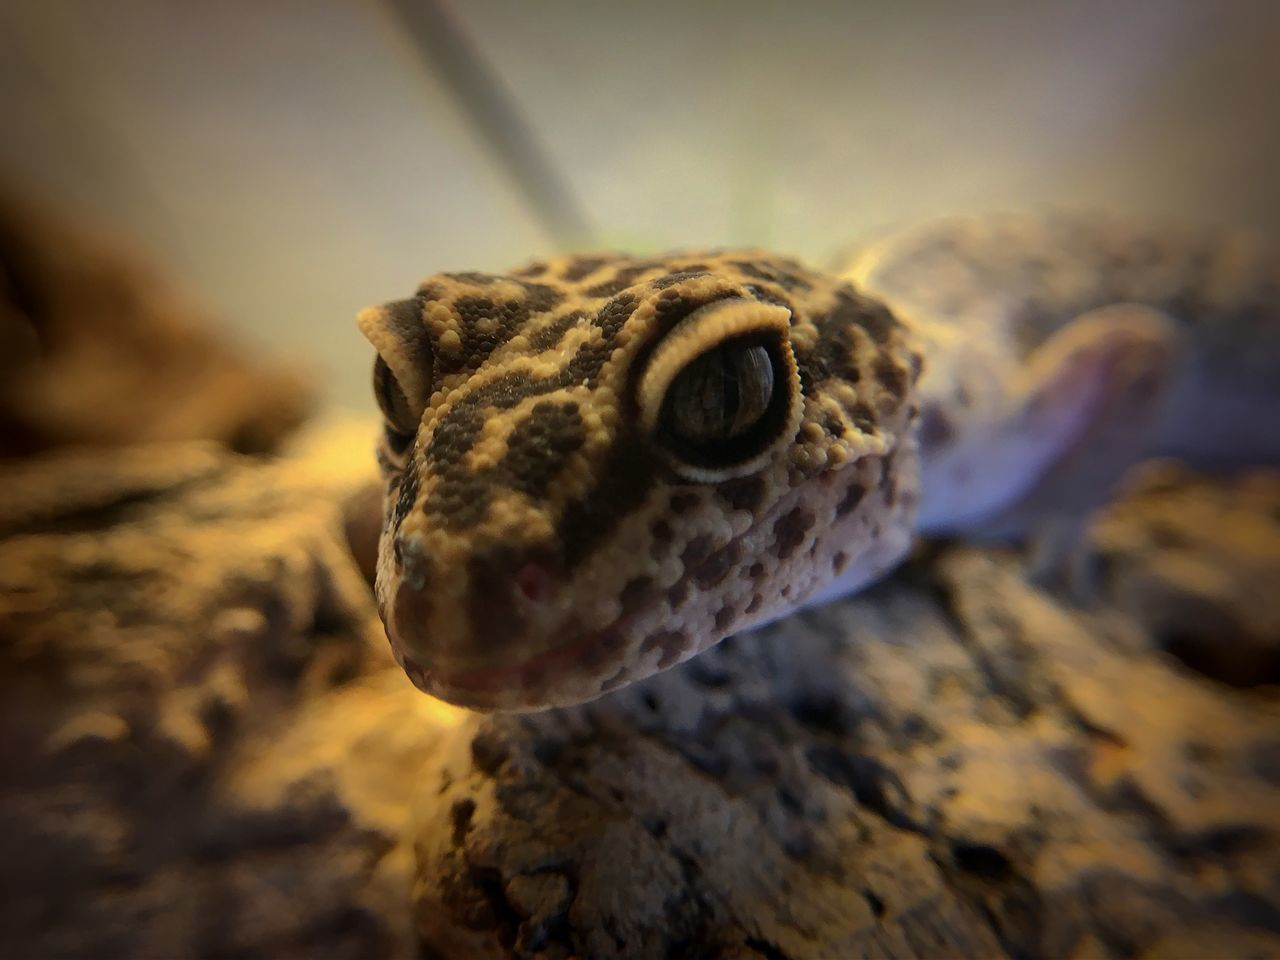 Macro shot of my leopard gecko. He didn´t get hurt ;) Animal Wildlife Lizard Saurian Close Up Close-up Closeup Gecko IPhone Leopard Macro Nature No People One Animal Reptile Animal Pet Nopeople Blurredbackground Vignette